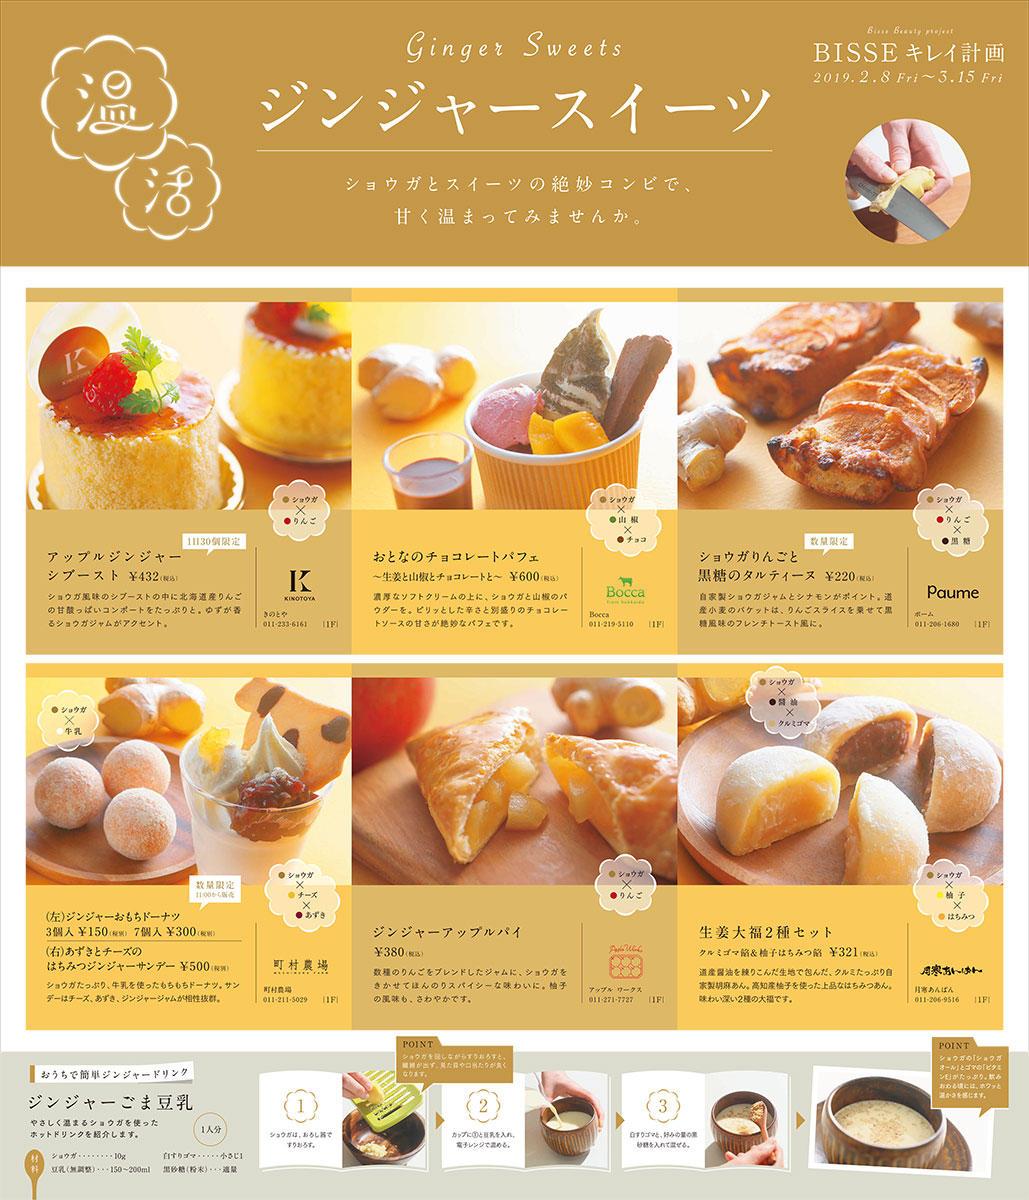 https://www.odori-bisse.com/info/news_190206_img2.jpg